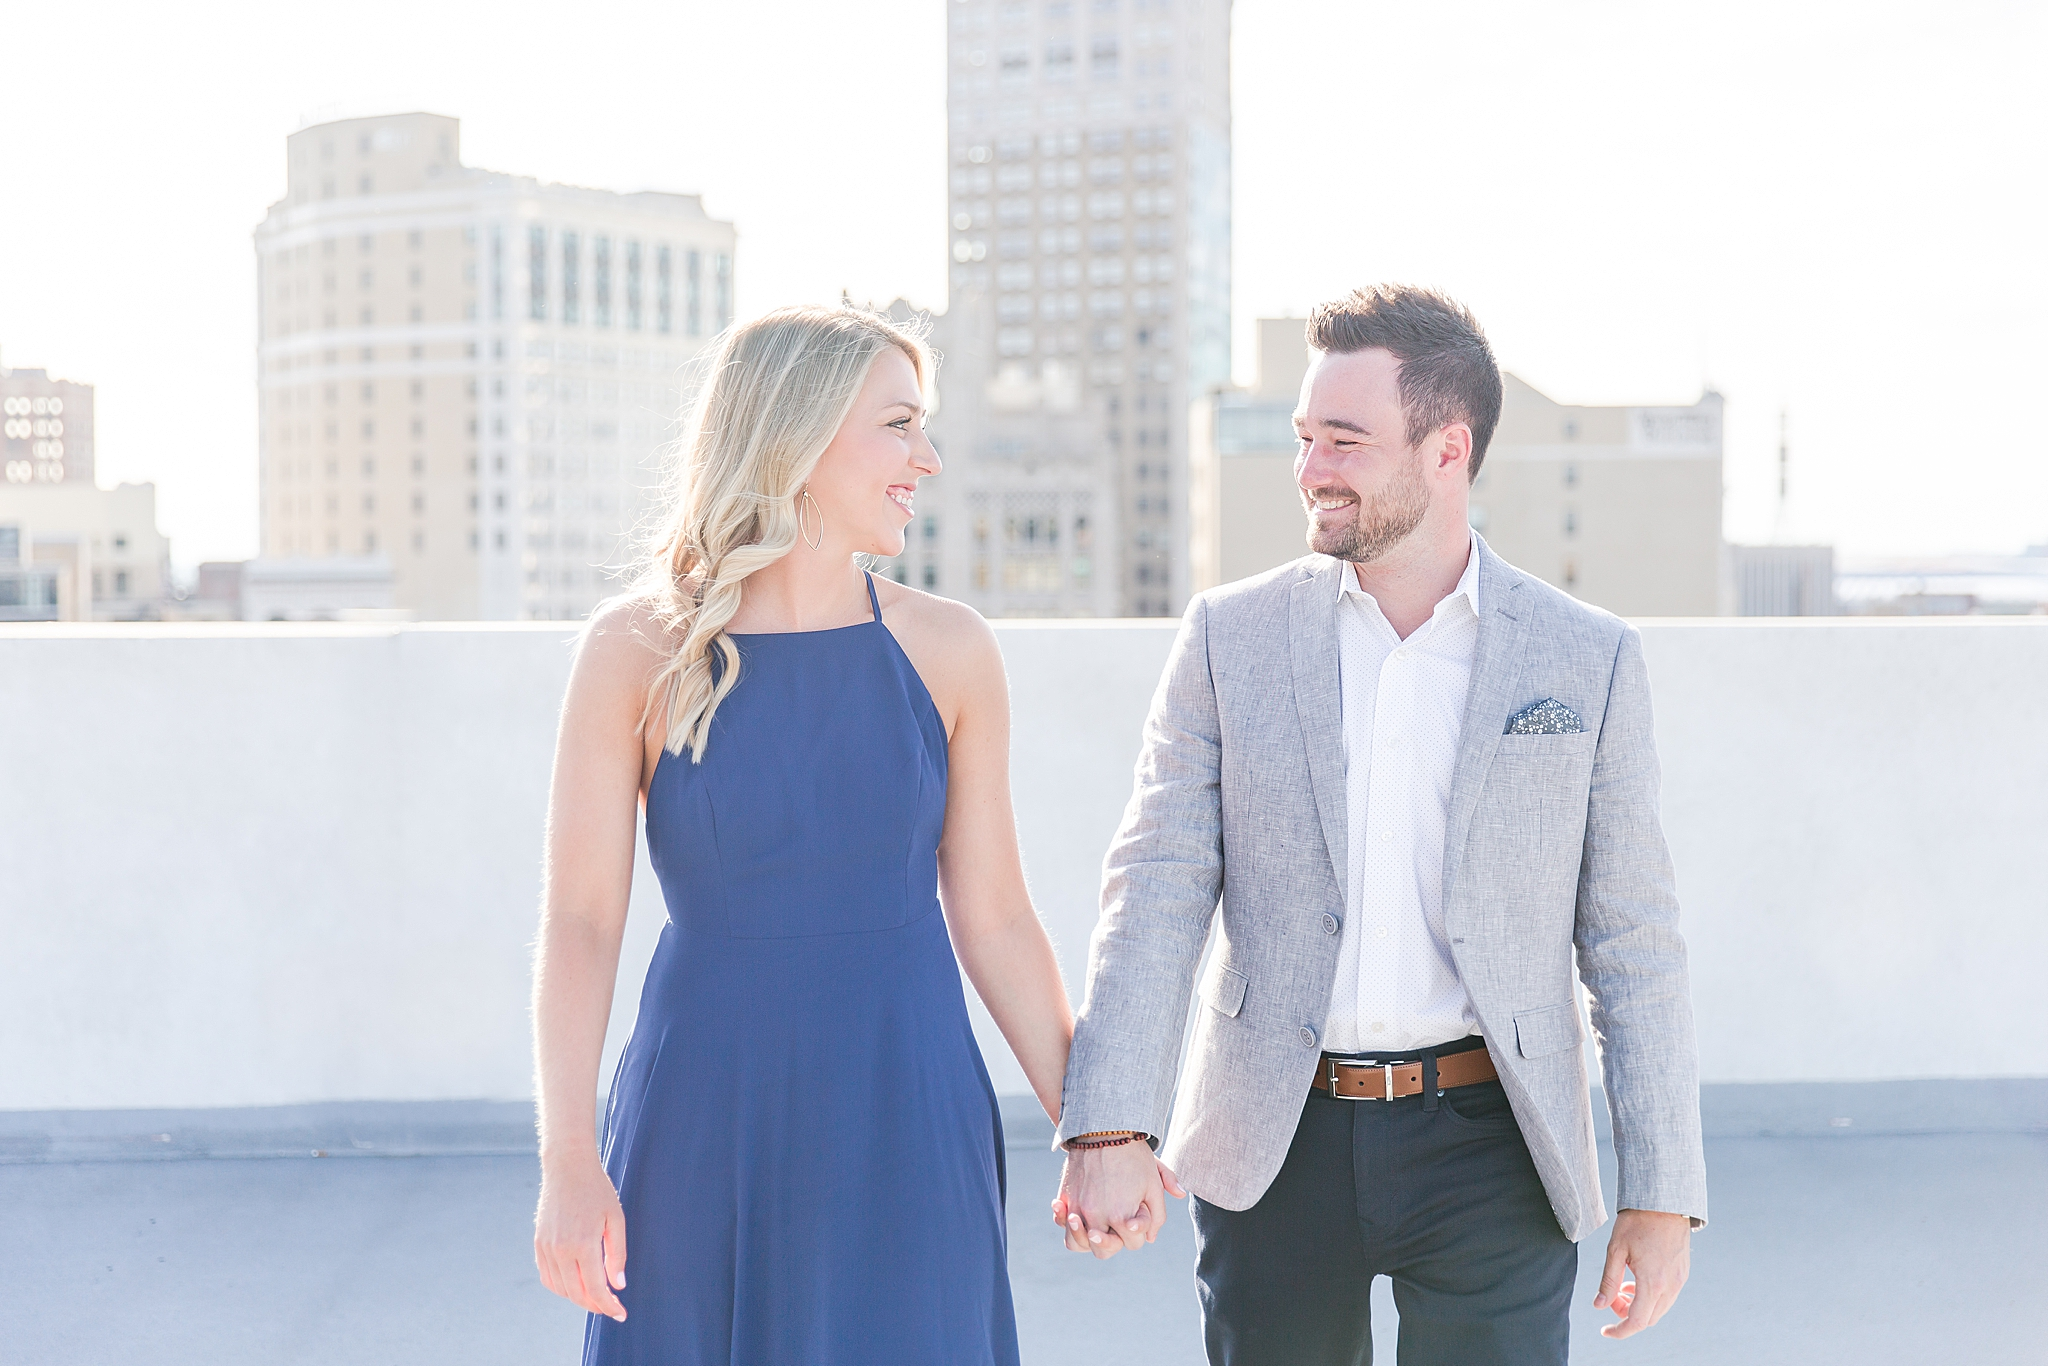 detroit-wedding-photographer-downtown-detroit-belle-isle-engagement-photos-sarah-eric-by-courtney-carolyn-photography_0003.jpg